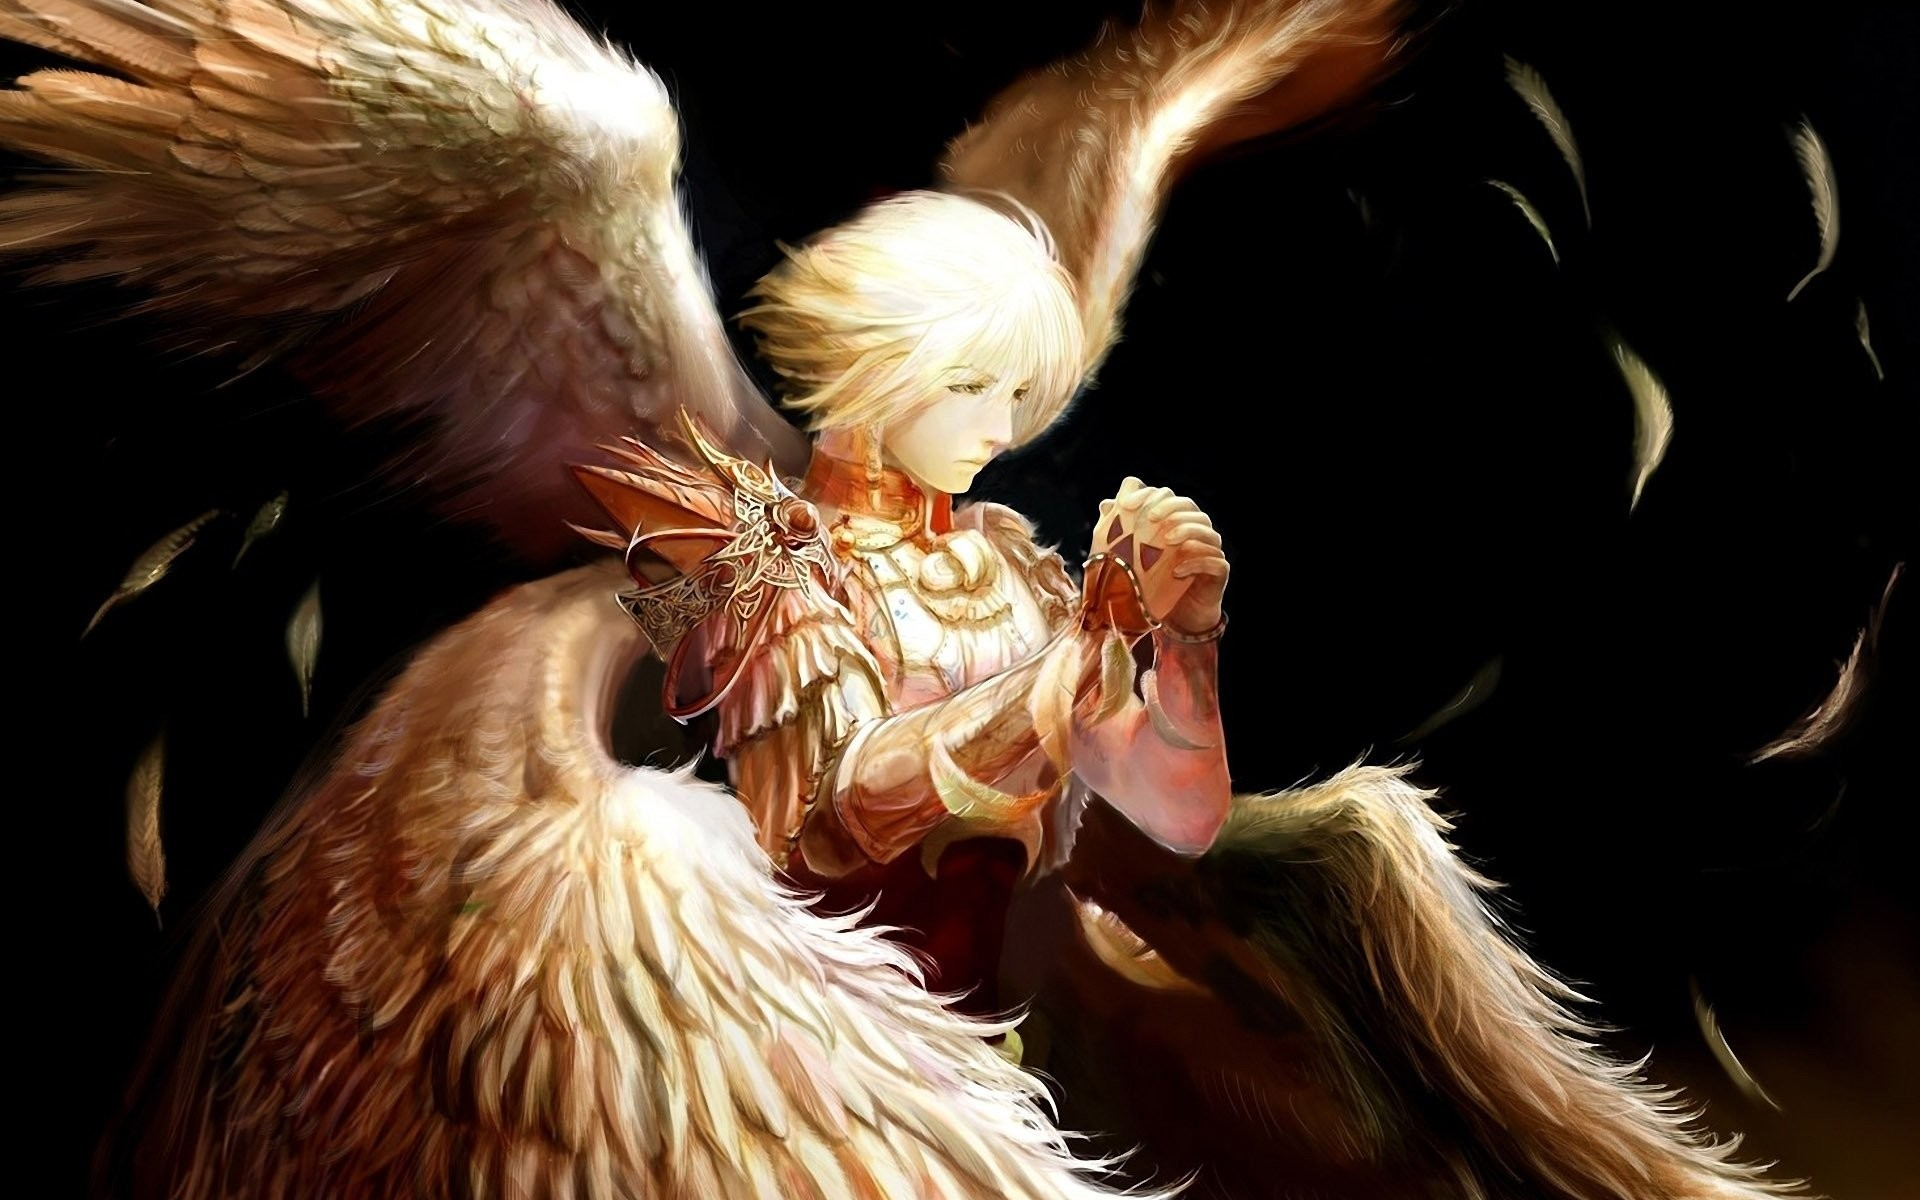 Angel wings feathers warrior male wallpaper | | 521187 |  WallpaperUP